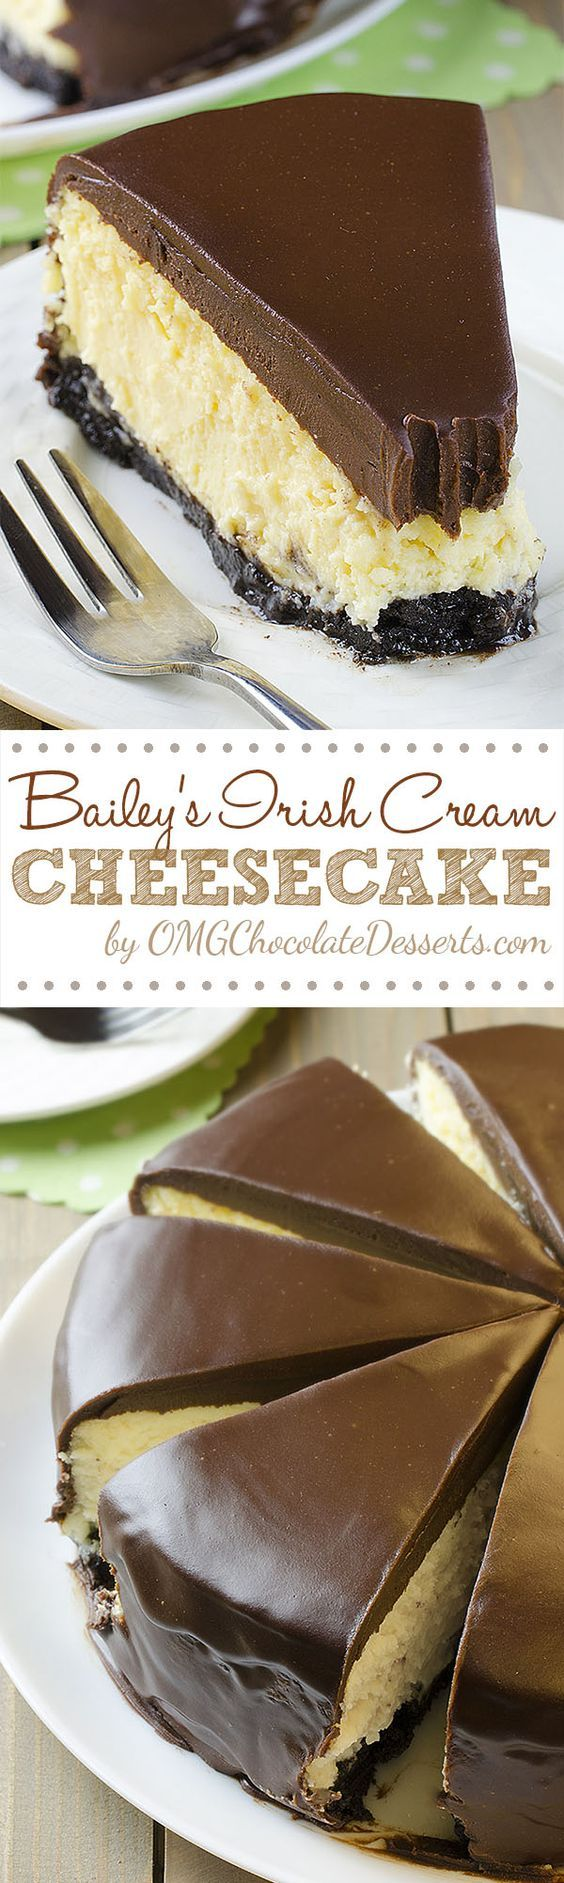 Boozy, sinful and decadent Irish Cream Cheesecake loaded with Bailey's Irish…